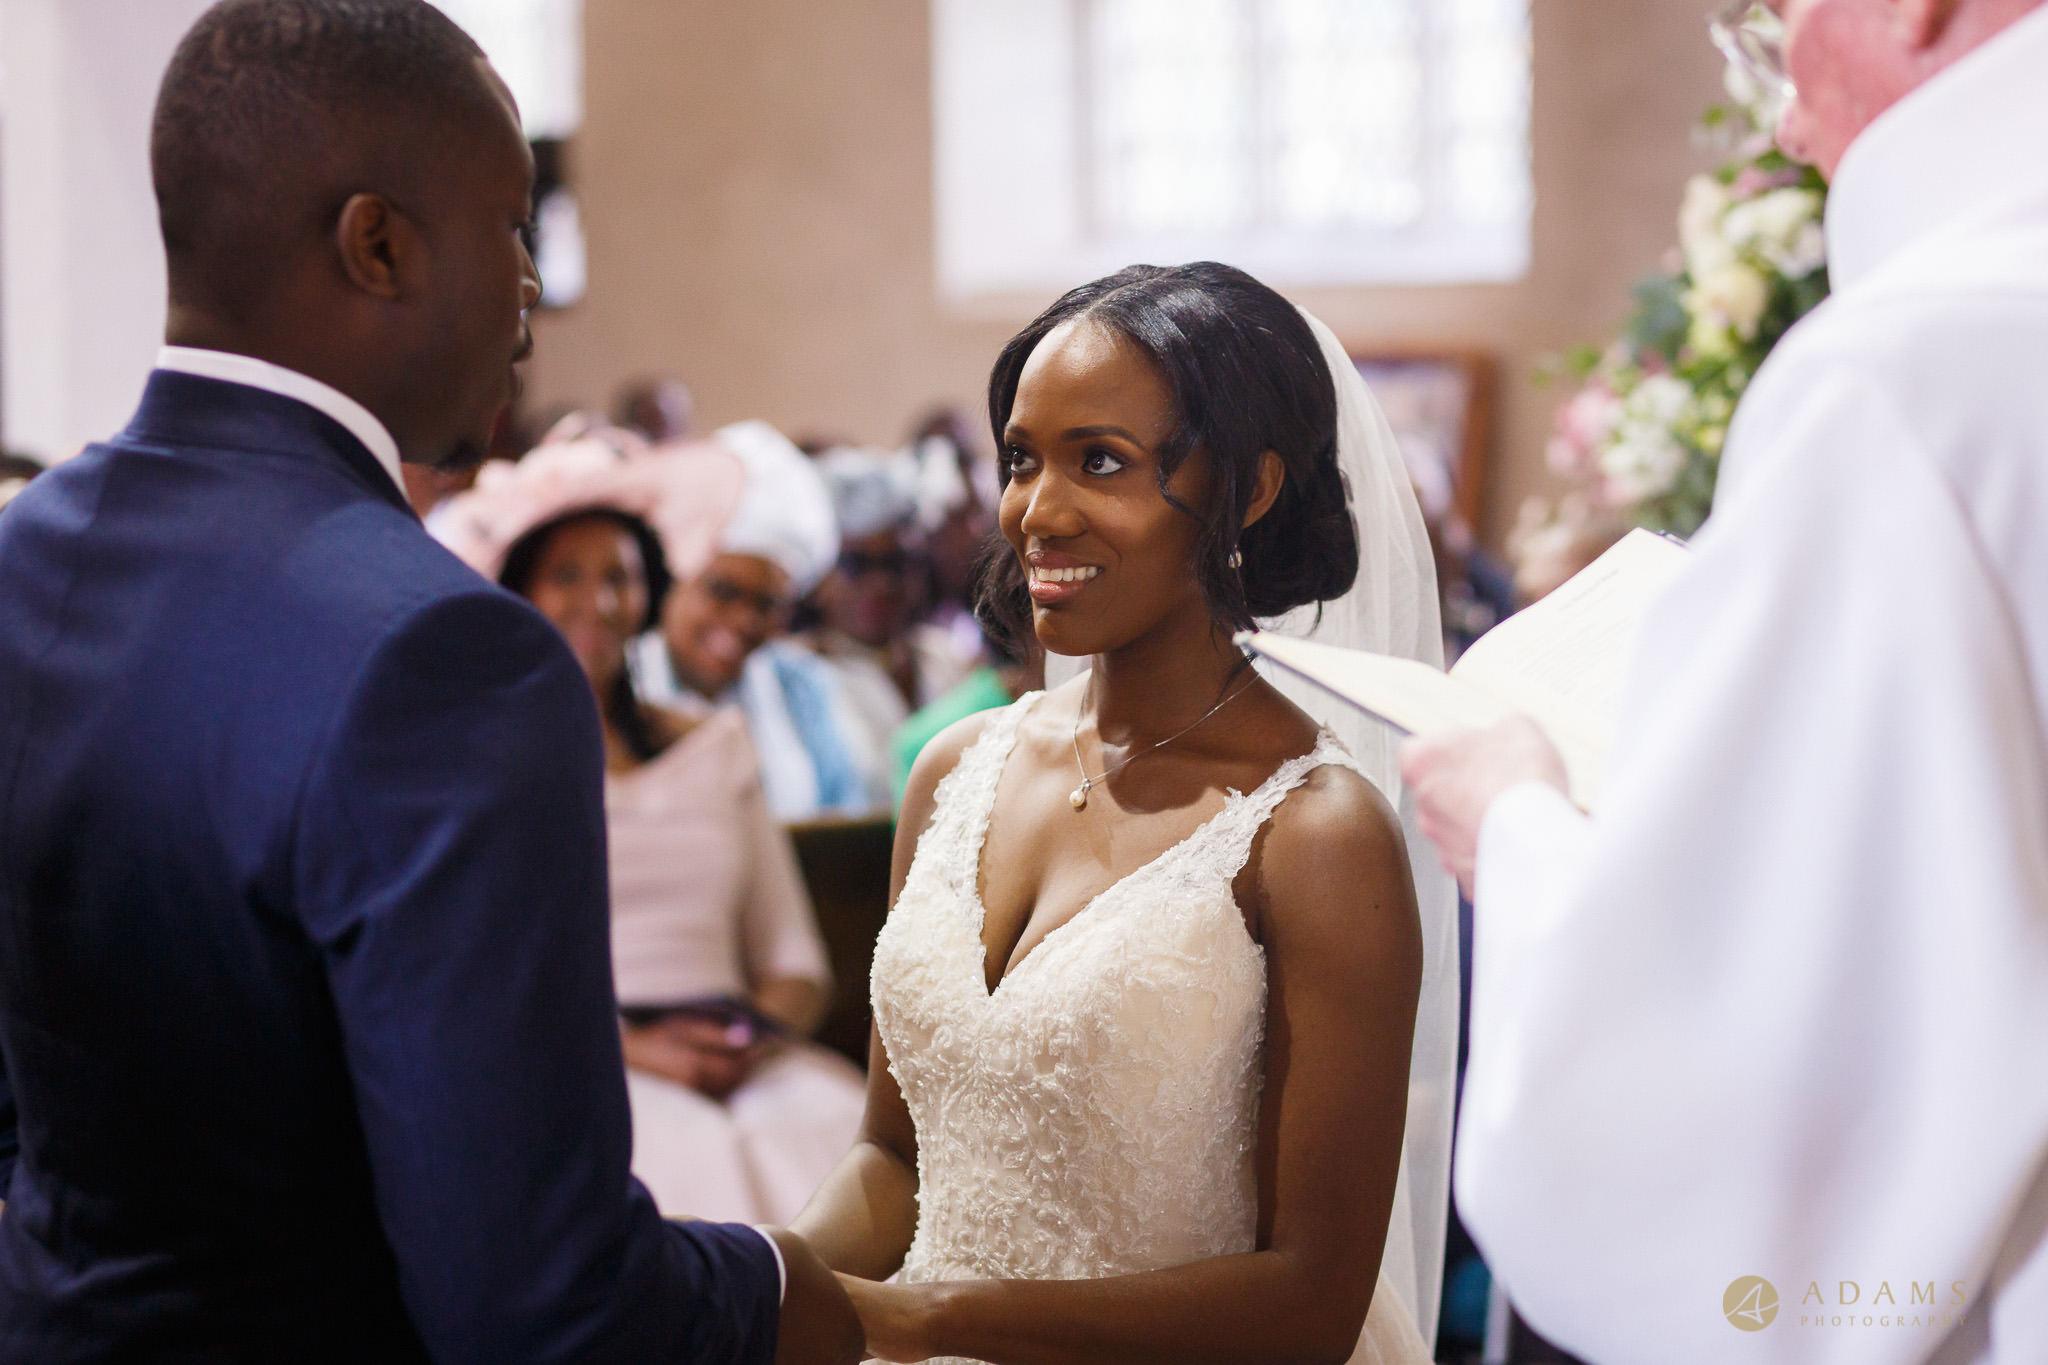 bride looking into the eyes of groom